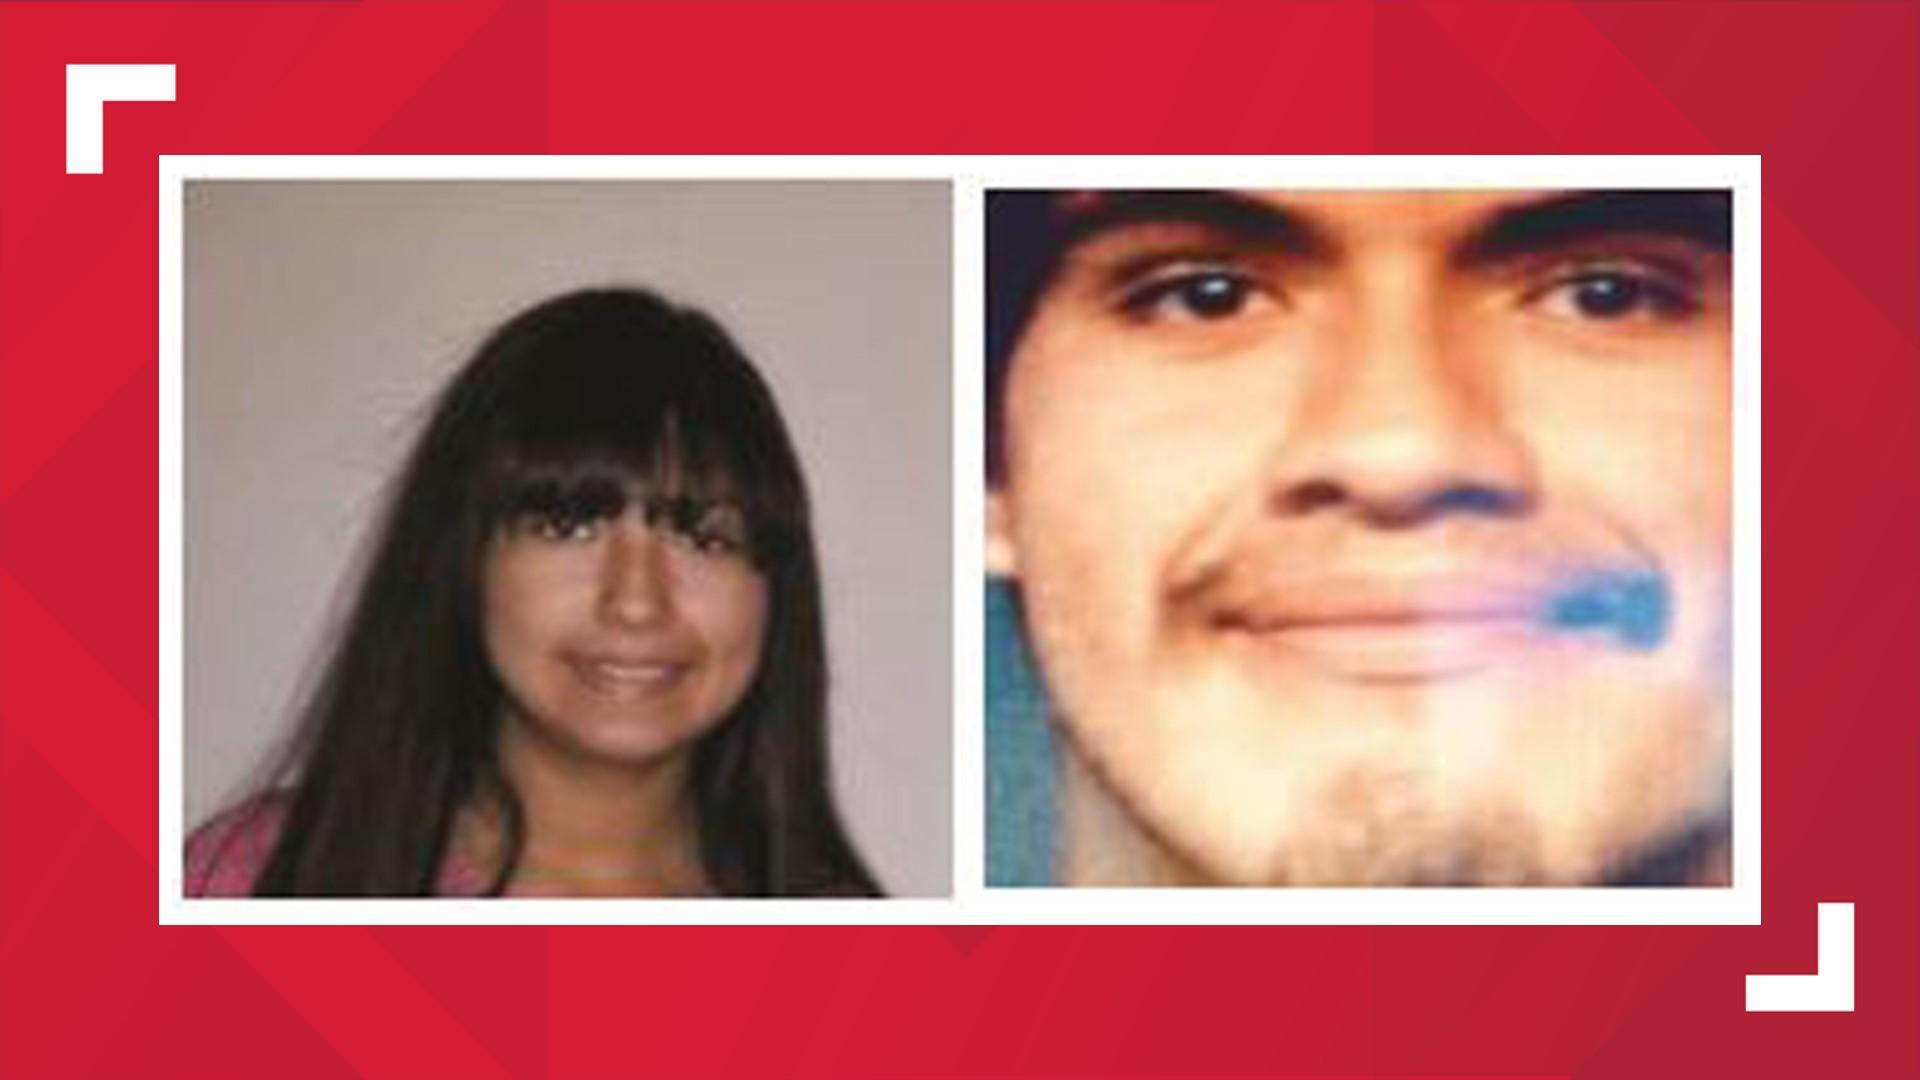 Missing Dallas Teen Found Safe: Police - NBC 5 Dallas-Fort